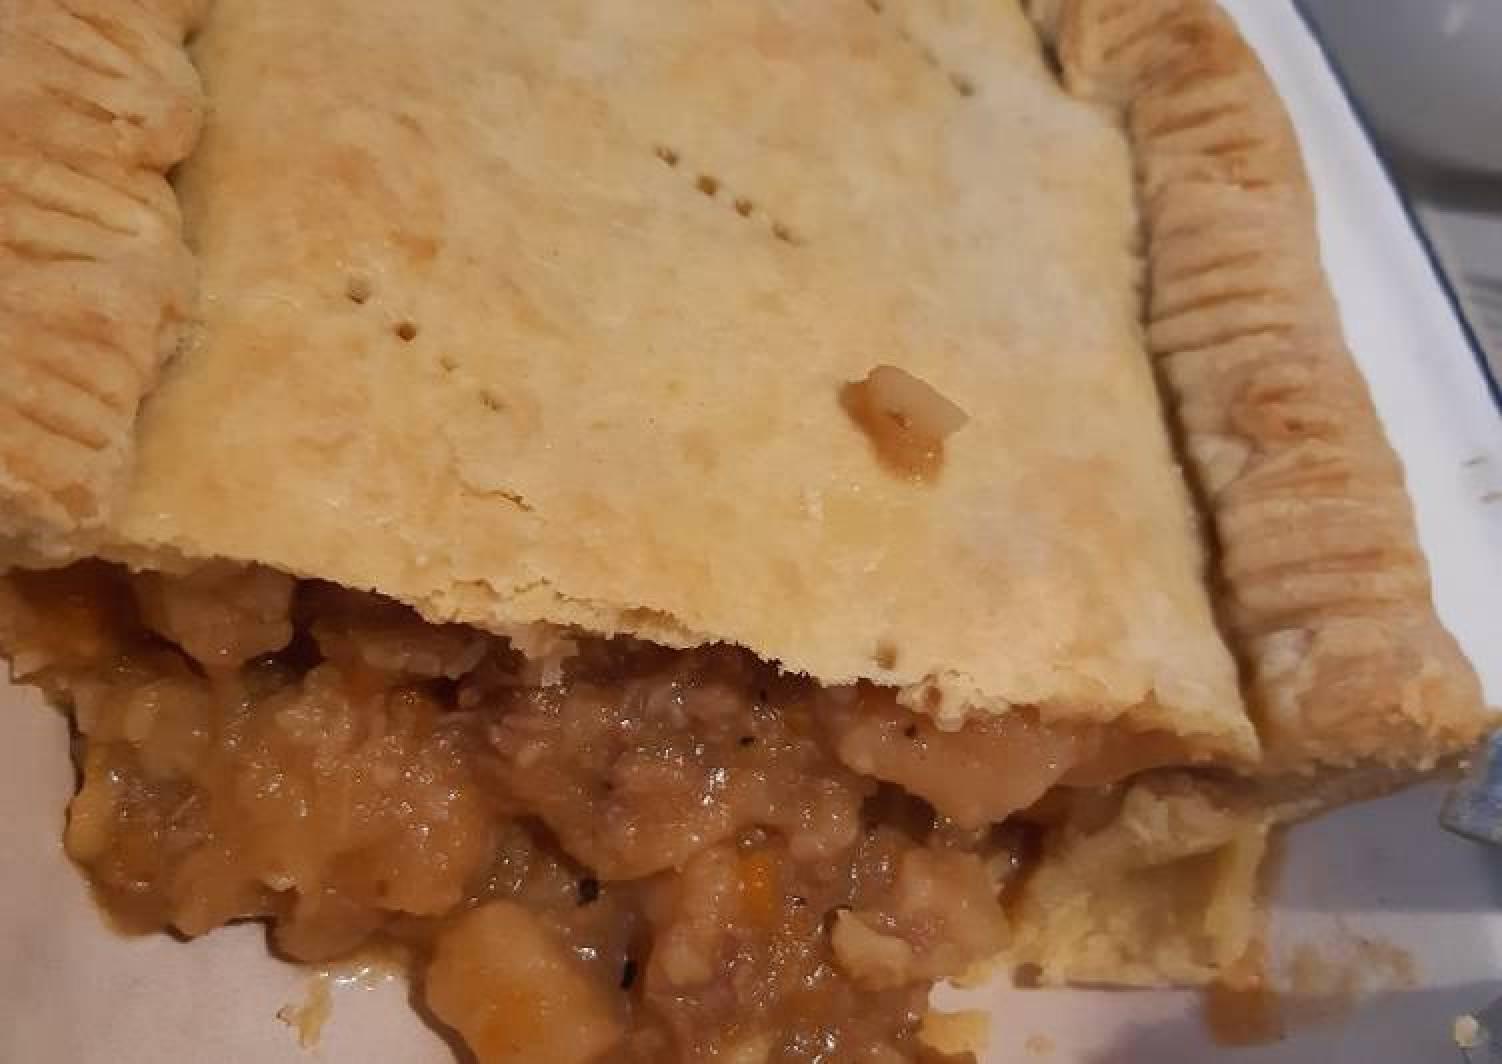 Scouse pie